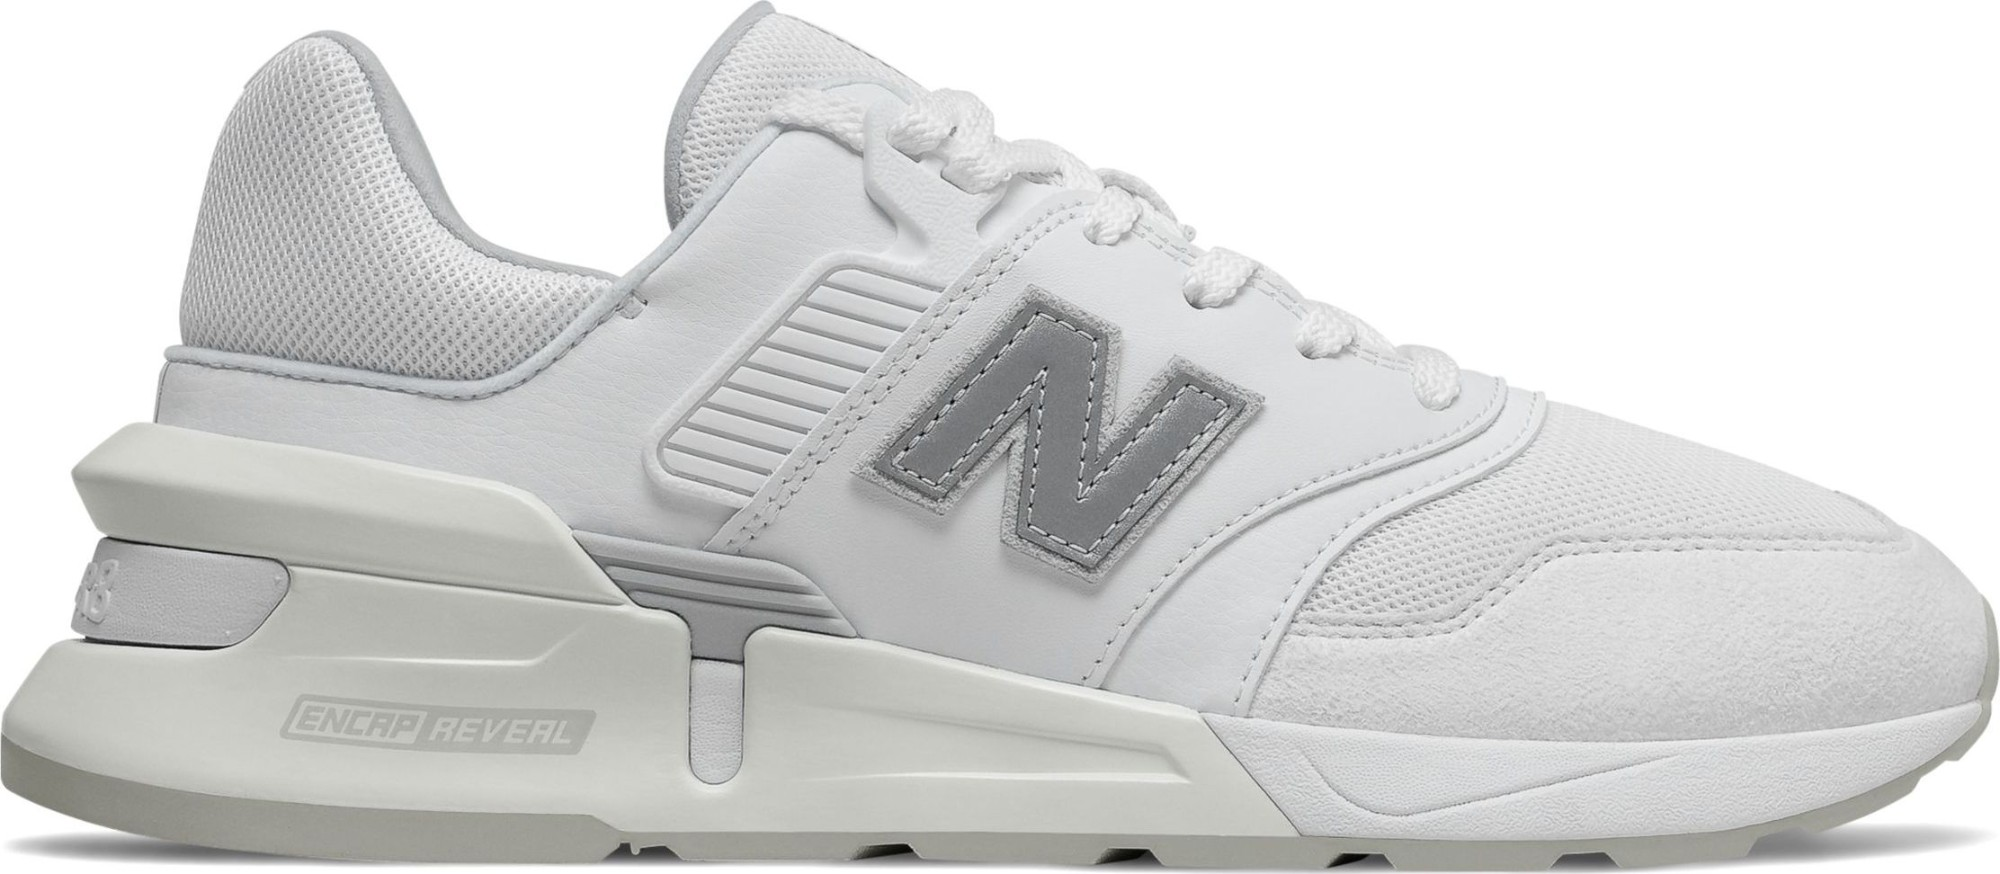 New Balance MS997 Sport White/Grey 37